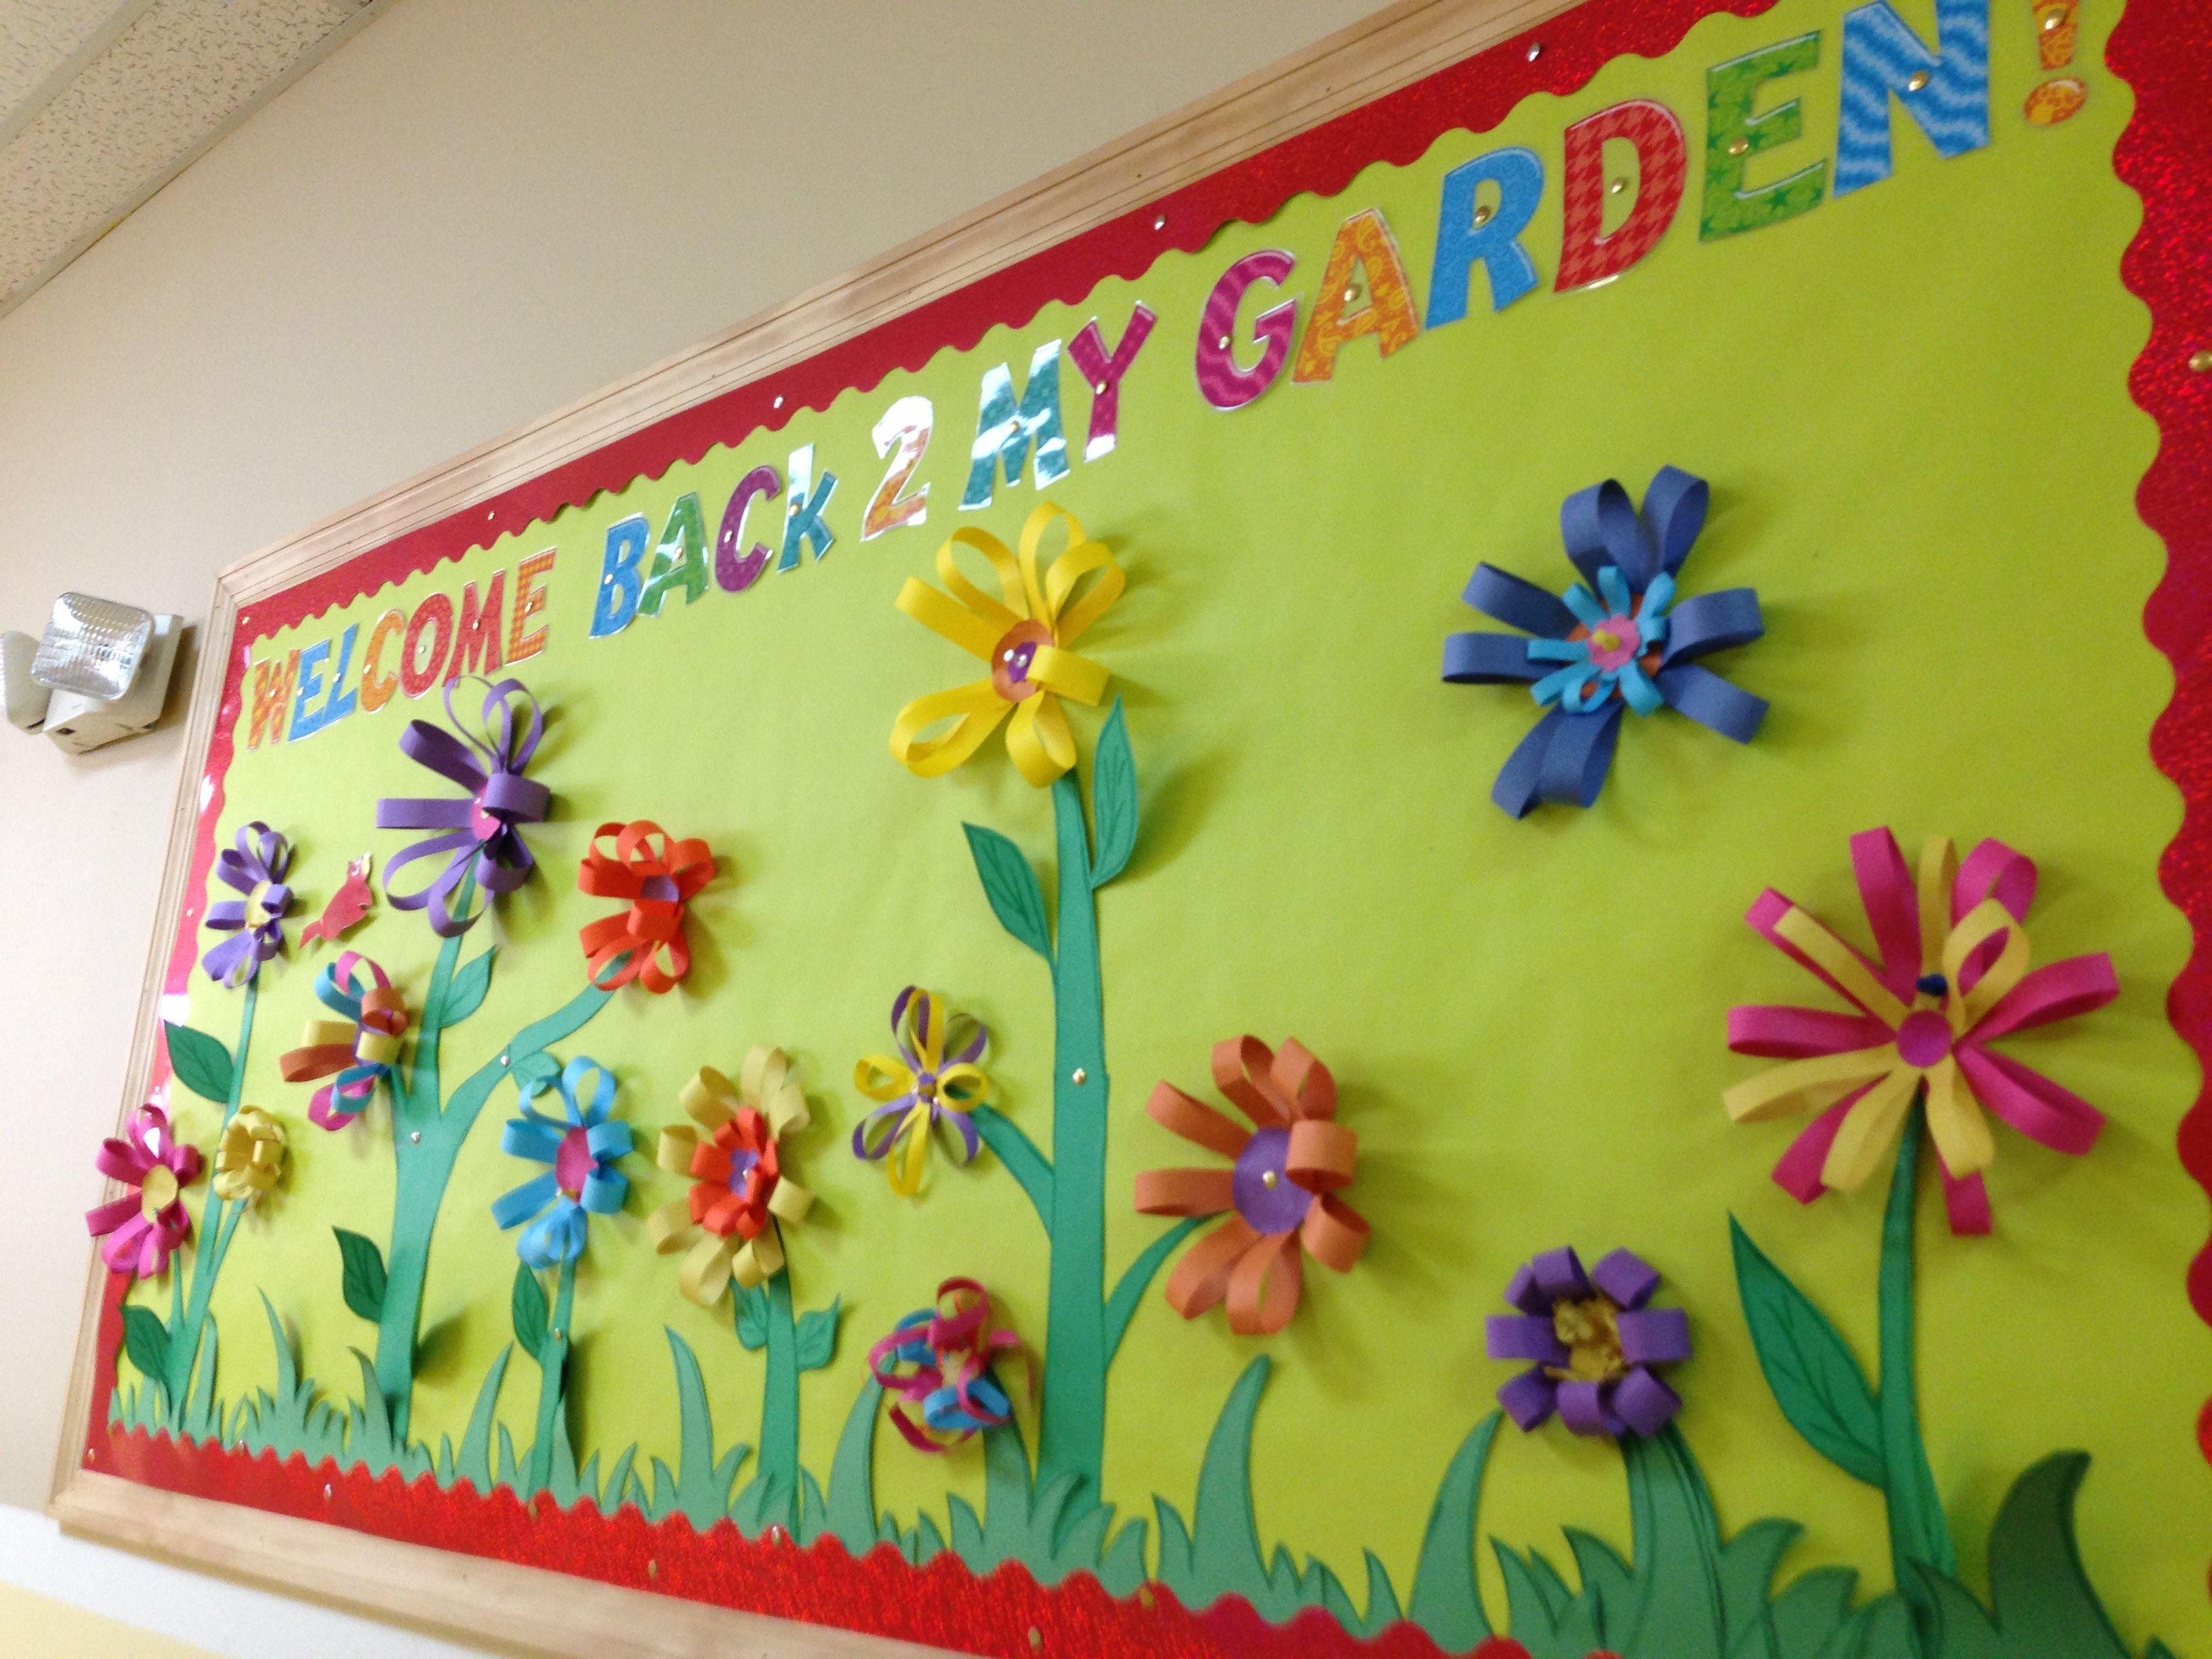 My Welcome Back 2 My Garden Bulletin Board! My Classroom